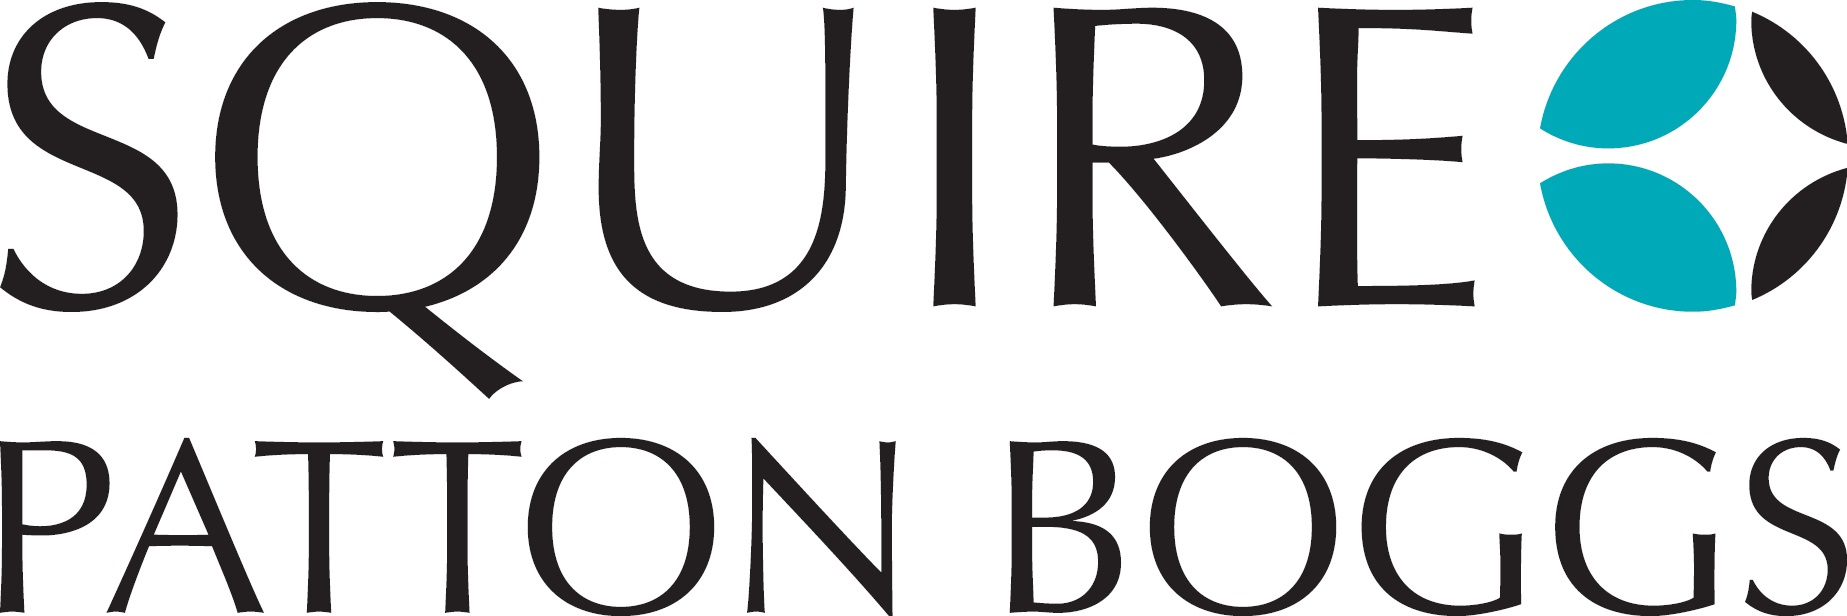 squire pb logo